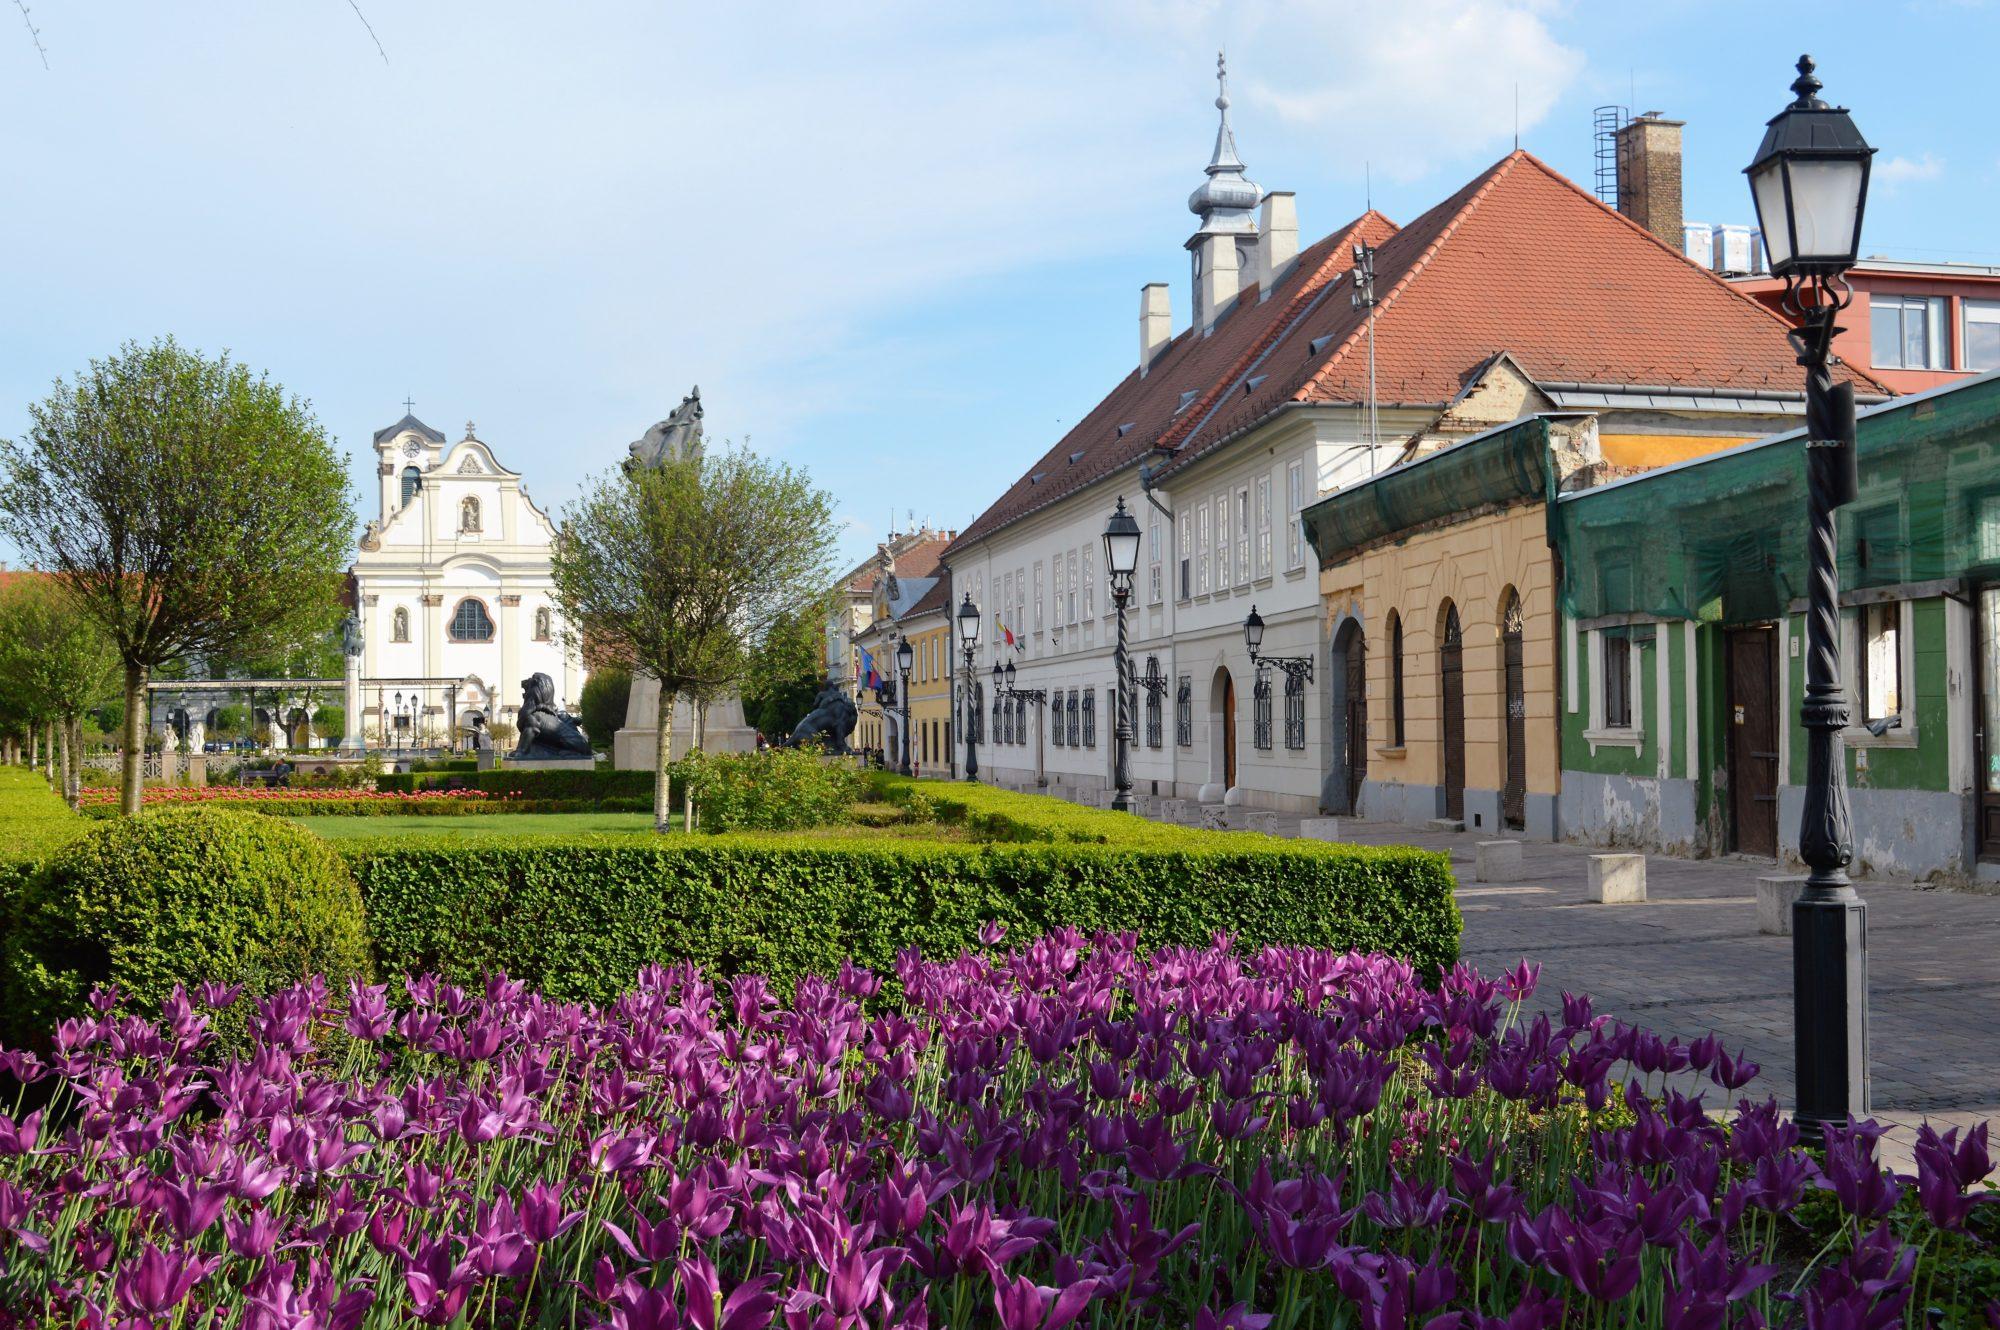 vac-main-square-flowers